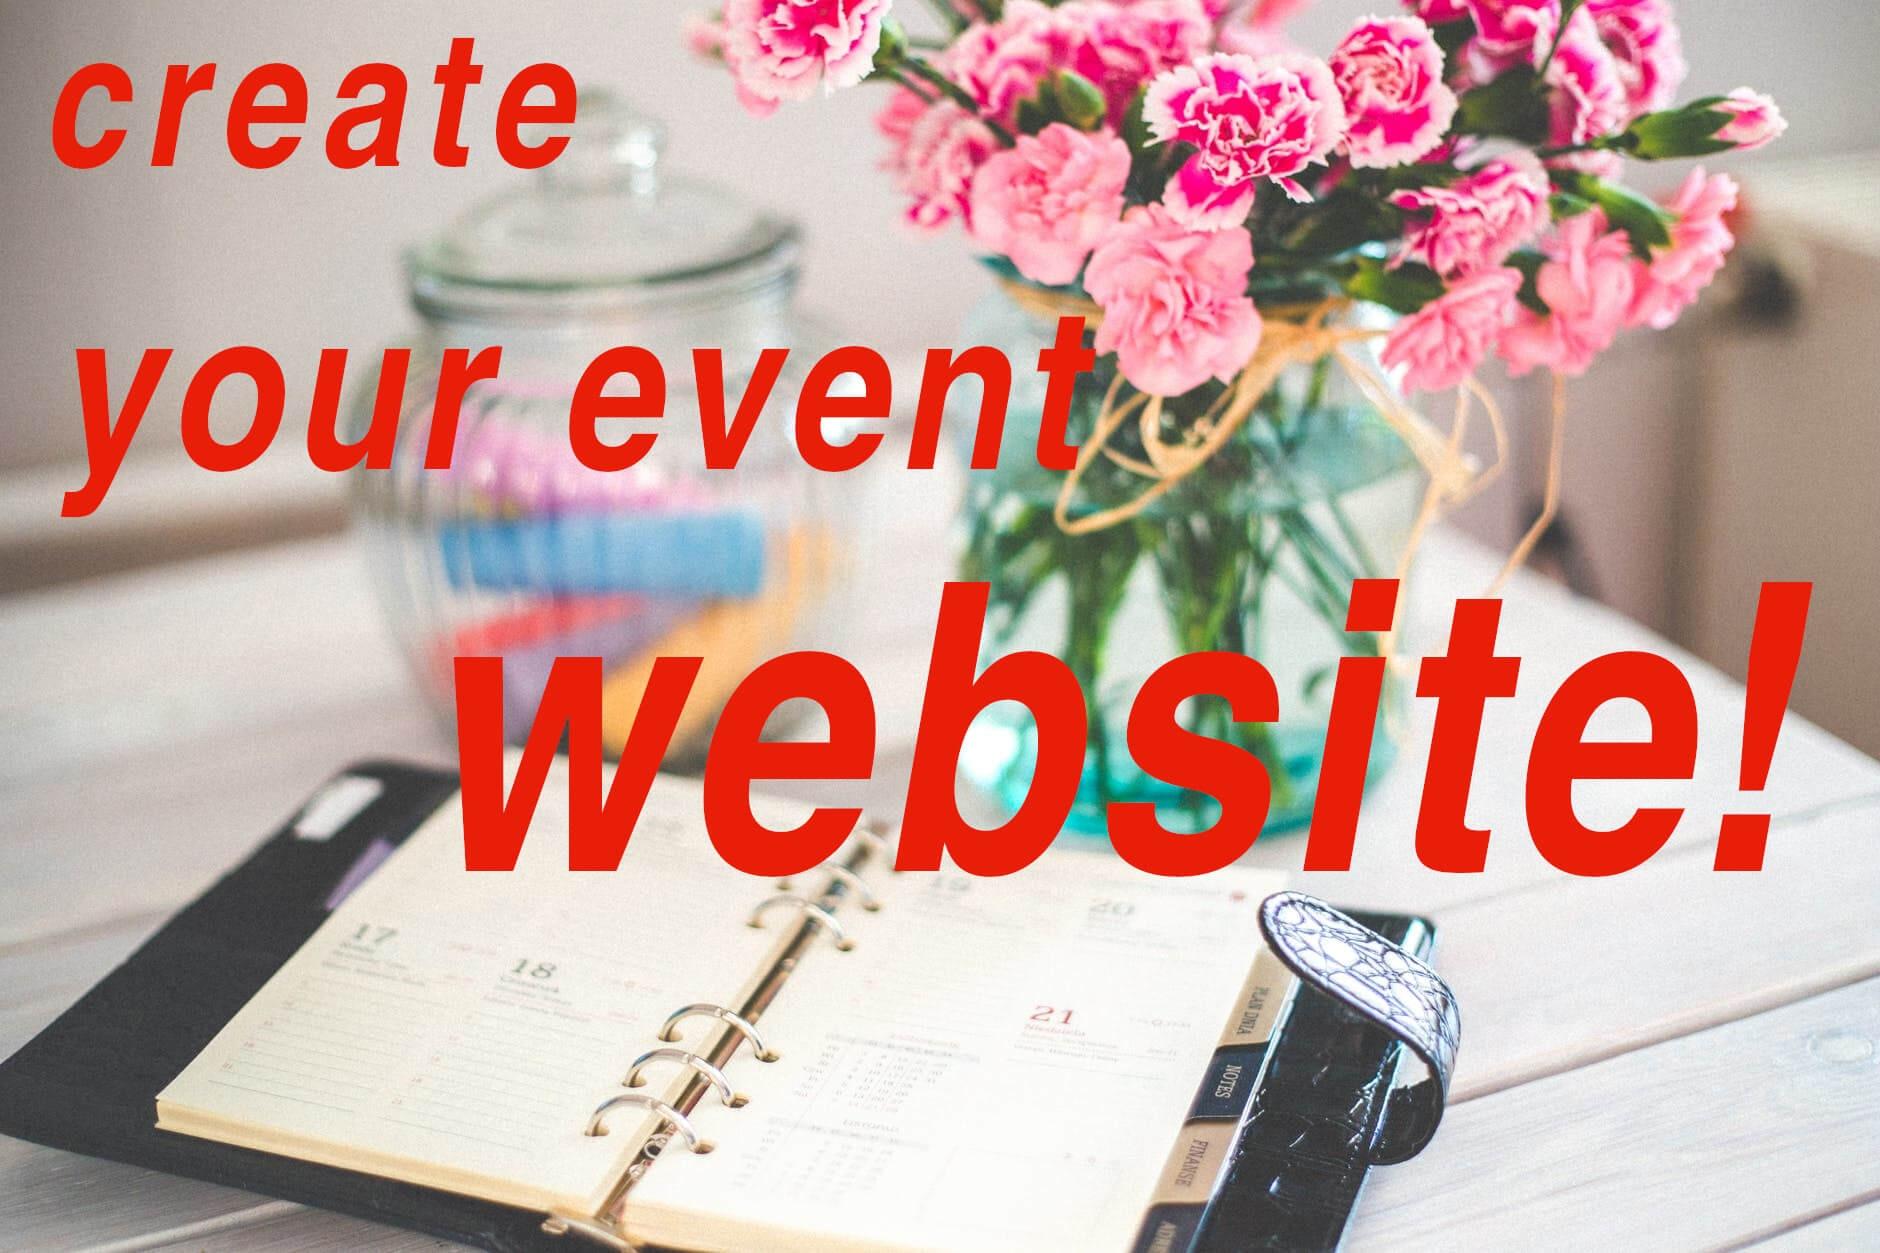 Joomla News: Create event website